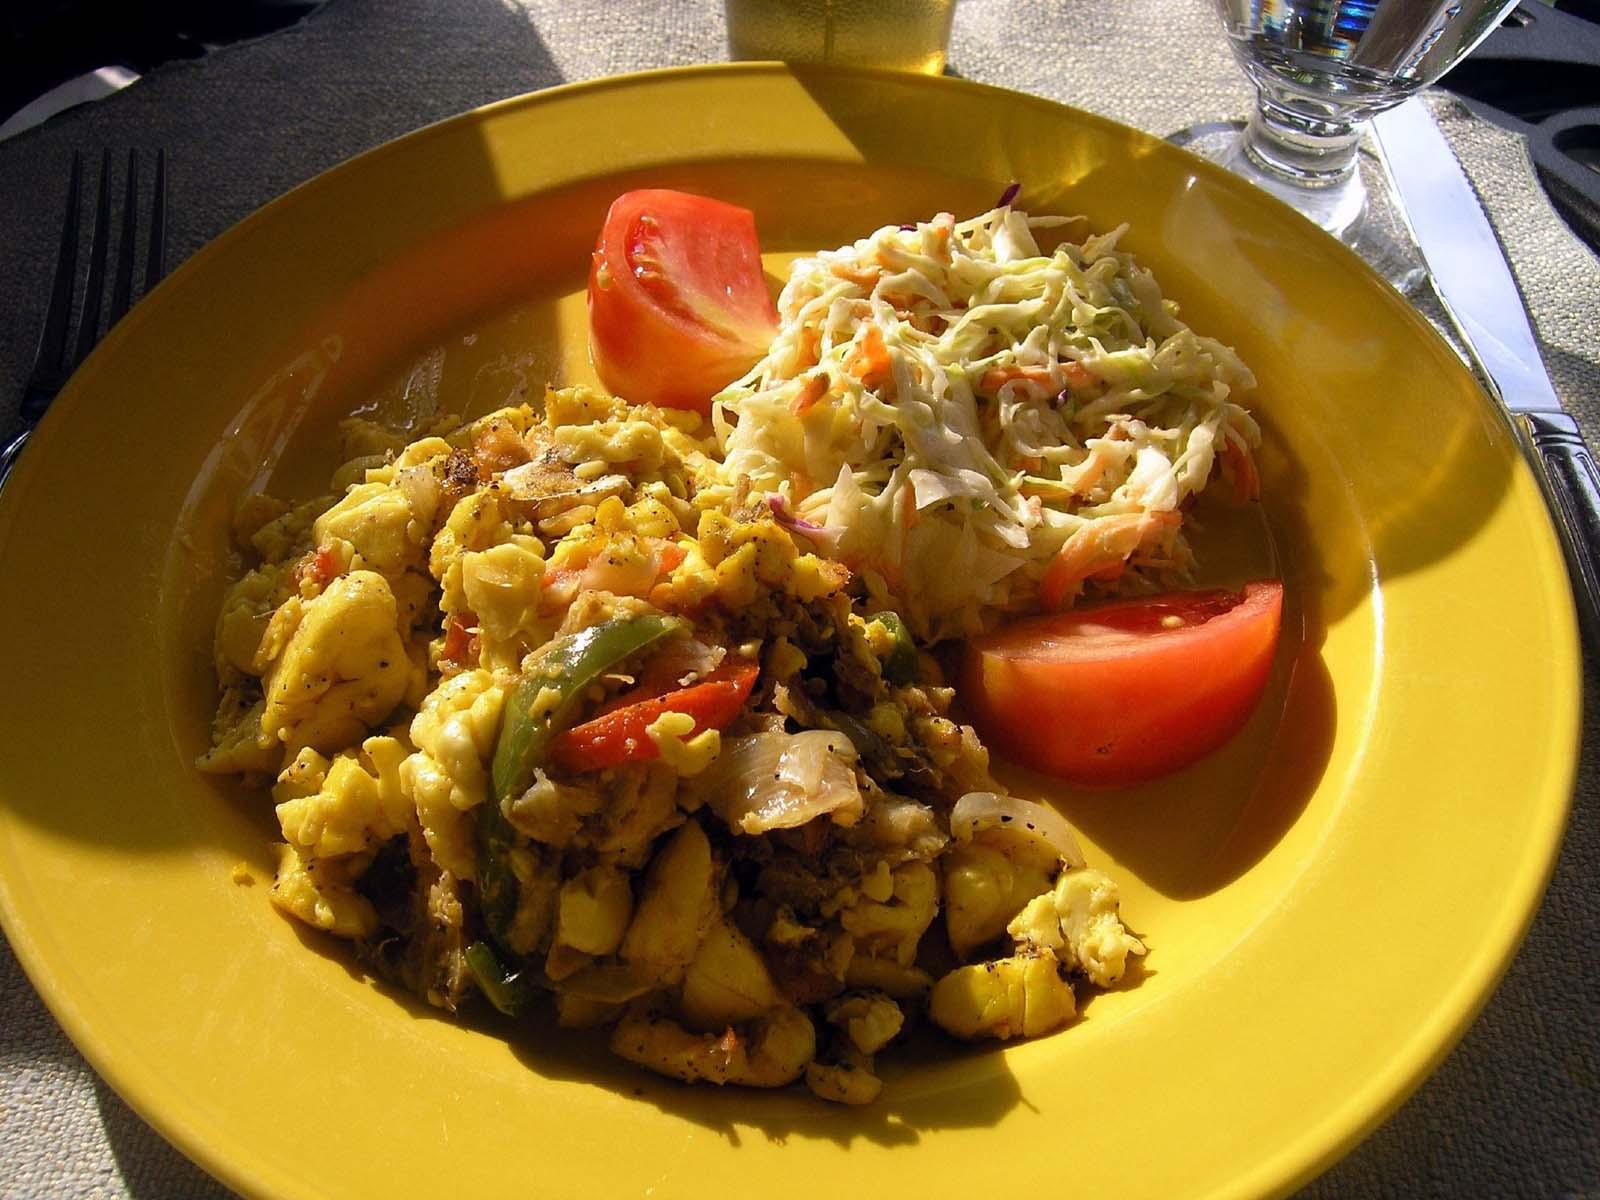 Ackee and Saltfish Jamaican Food